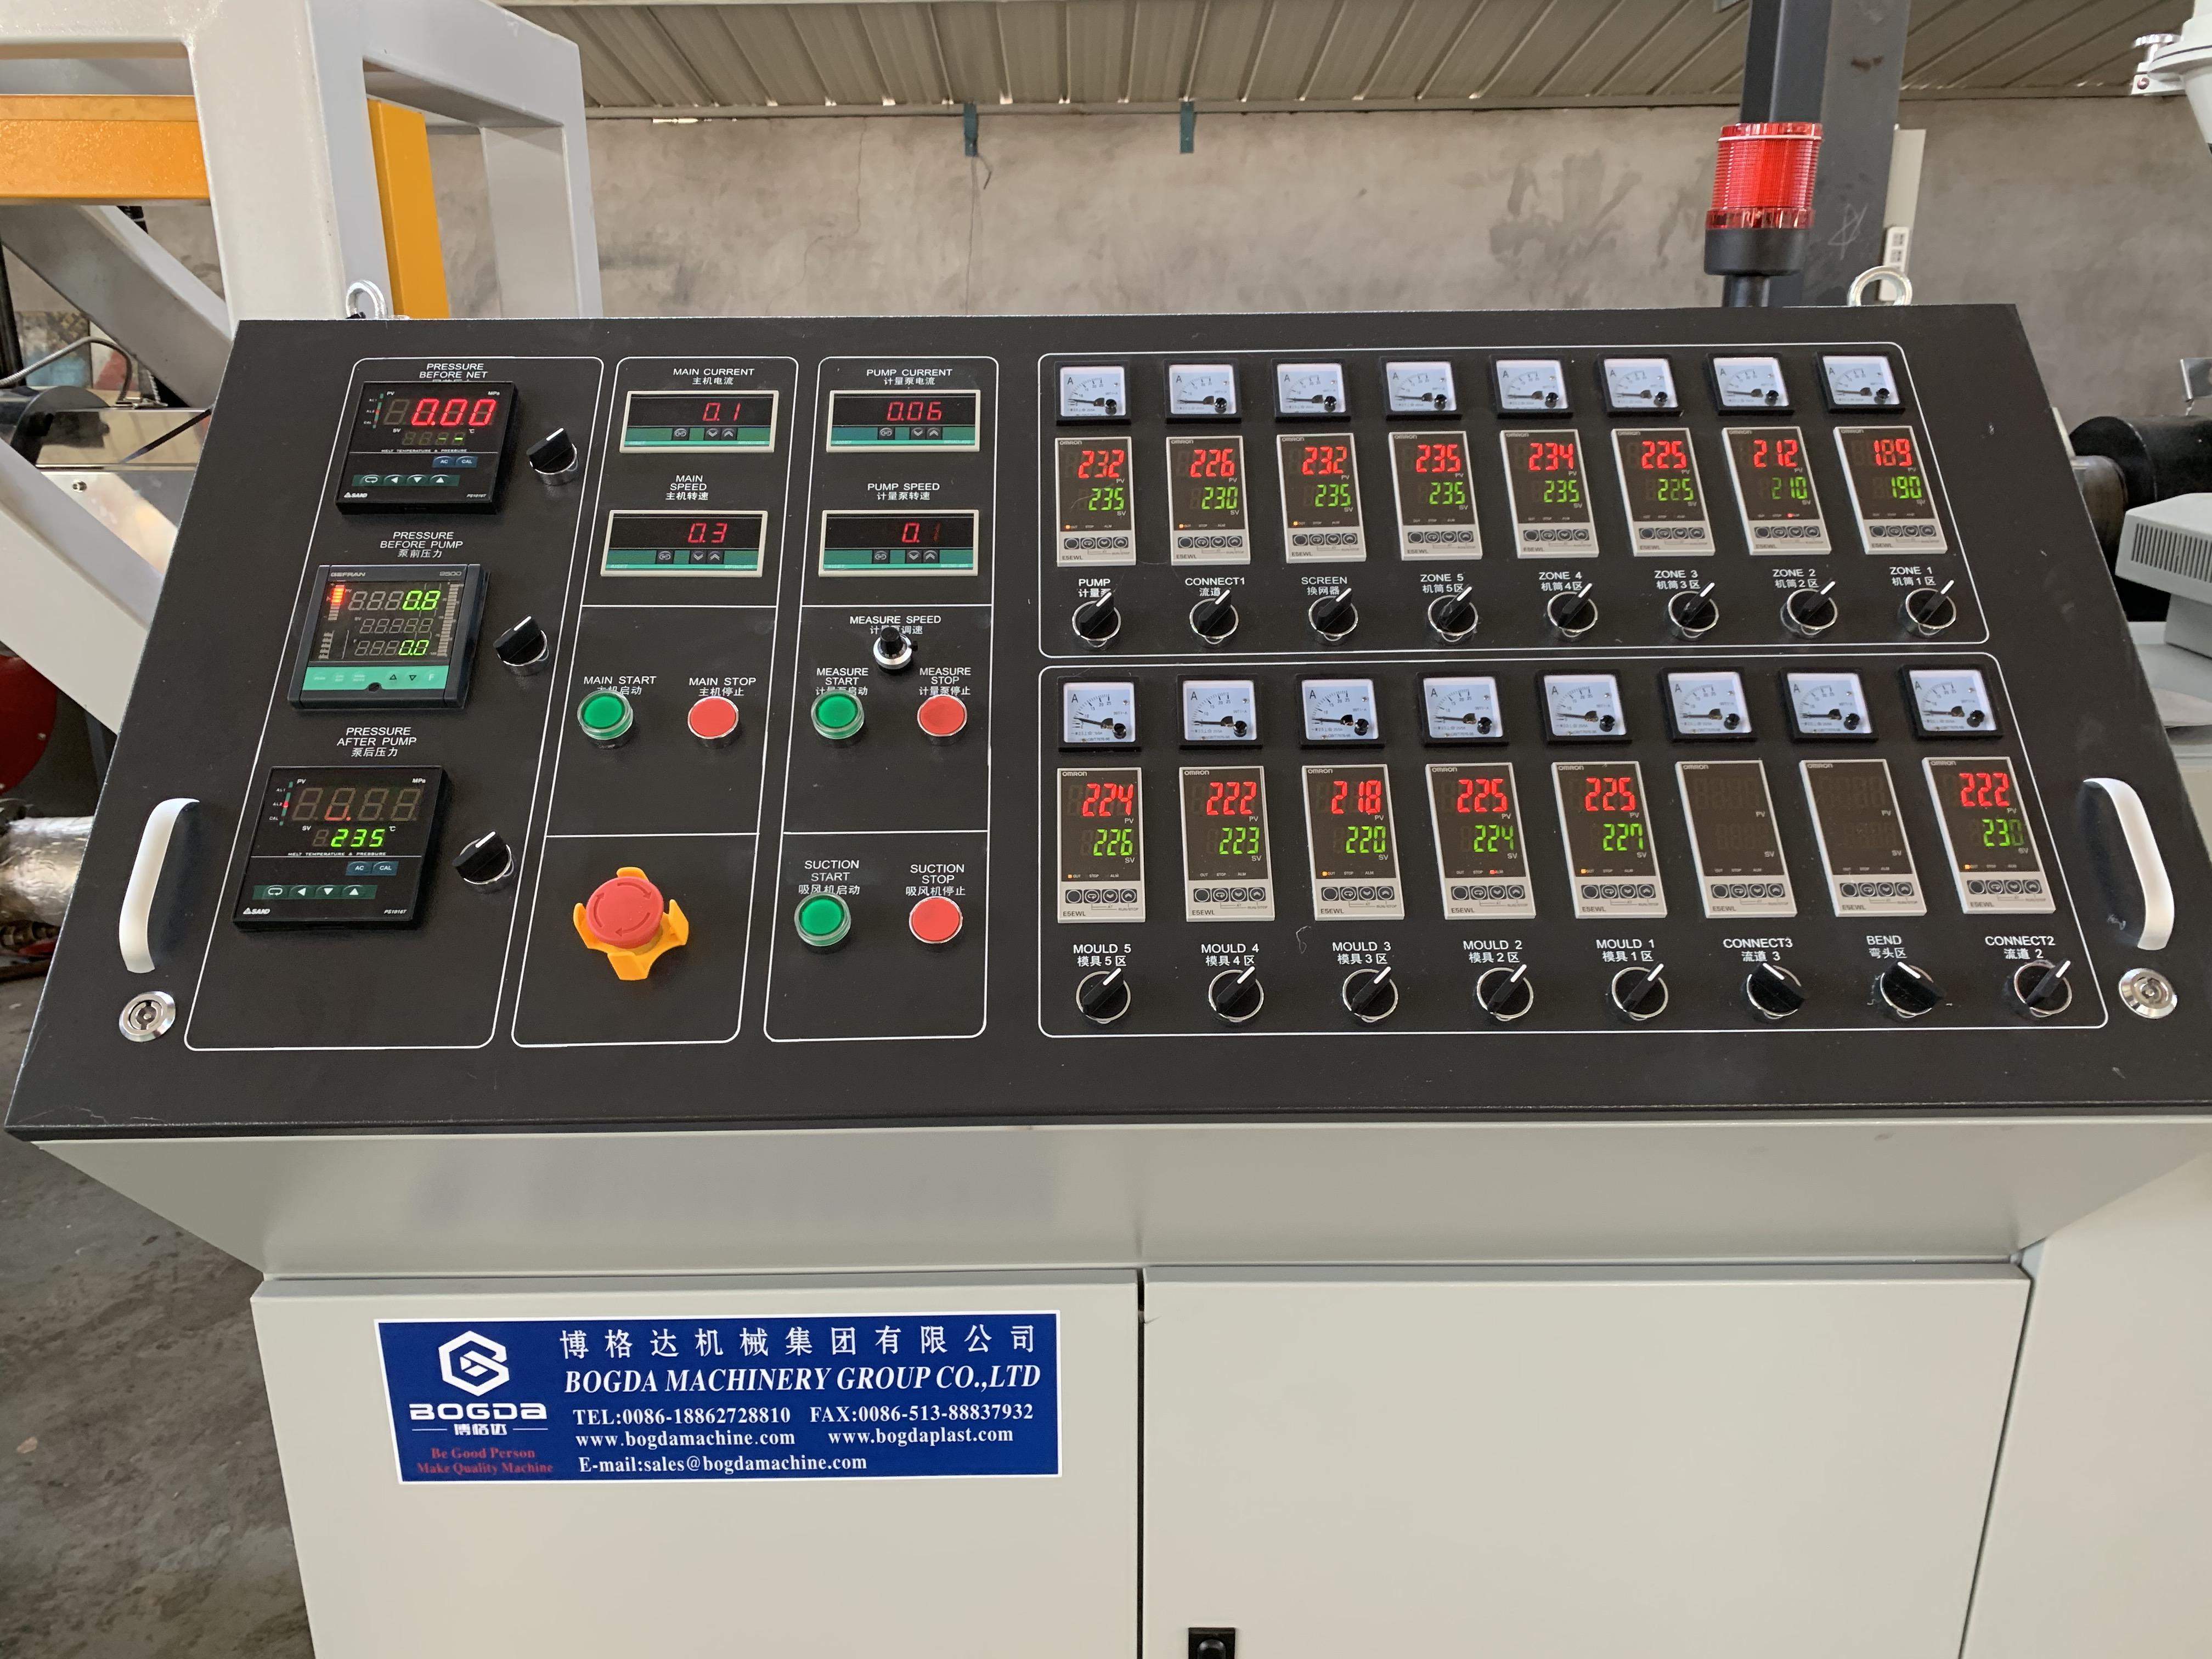 800mm Horizonal Type PP Melt Blown Fabric Manufacturing Plant